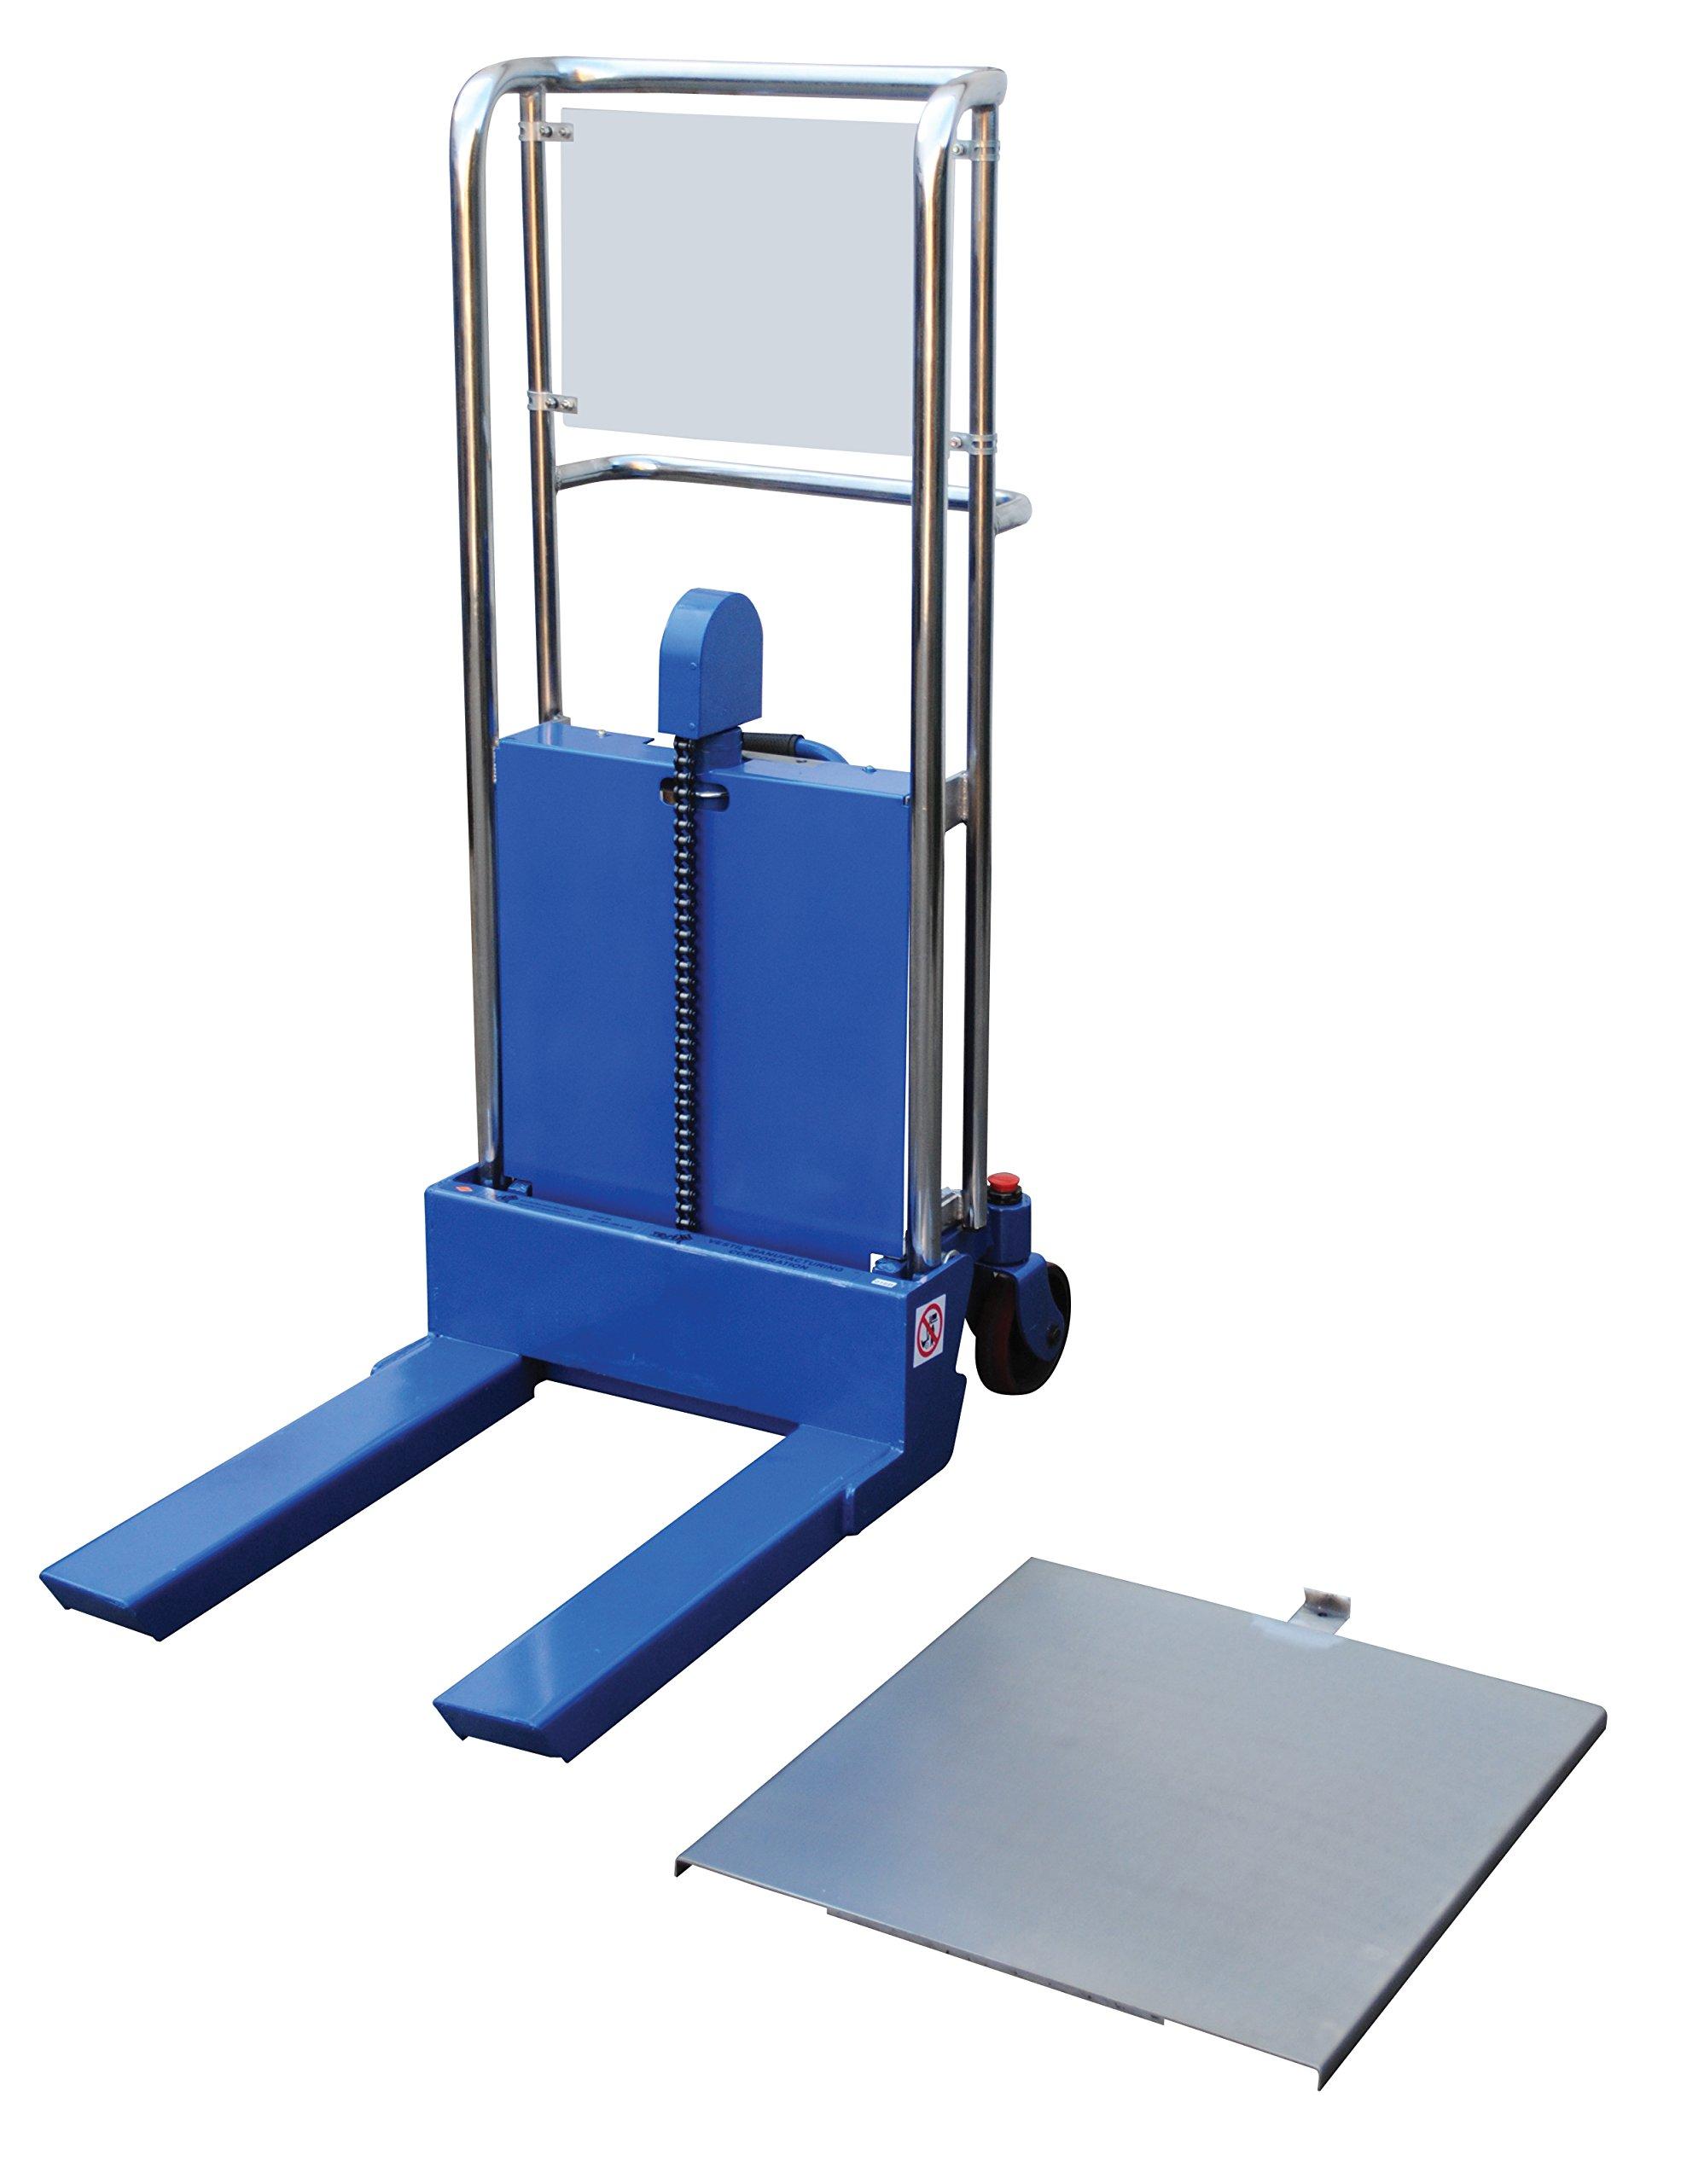 Vestil HYD-5 Portable Foot Pump Hefti-Lift, 41'' x 54'', Blue